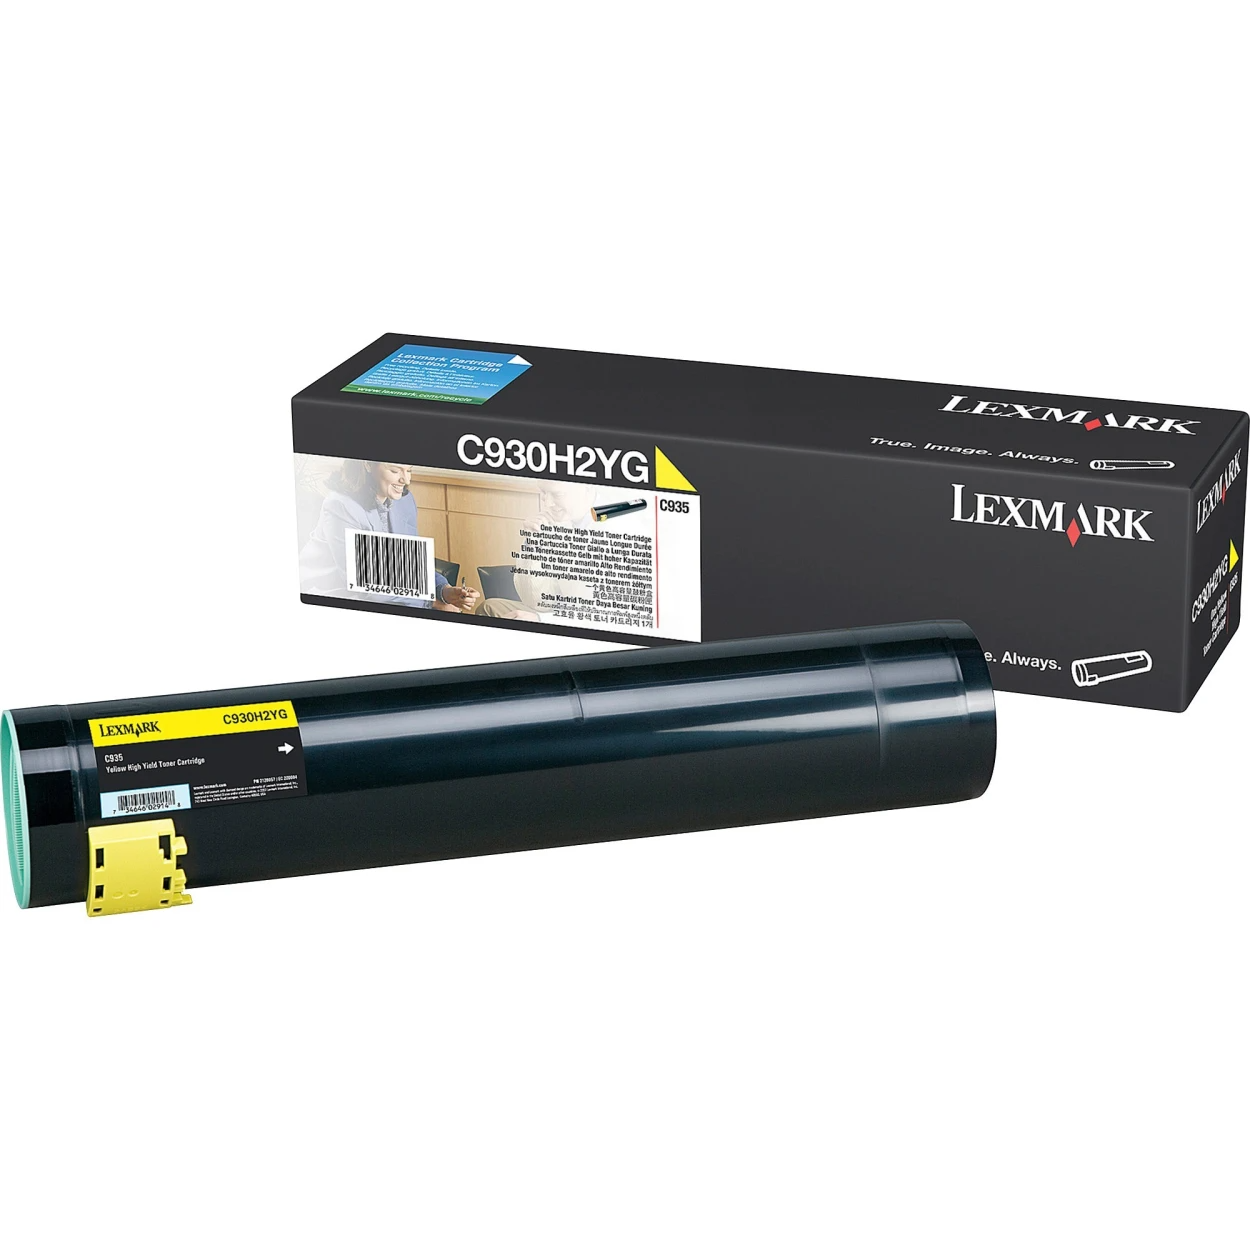 Original Lexmark C930H2YG C935 Yellow High Yield Toner Cartridge